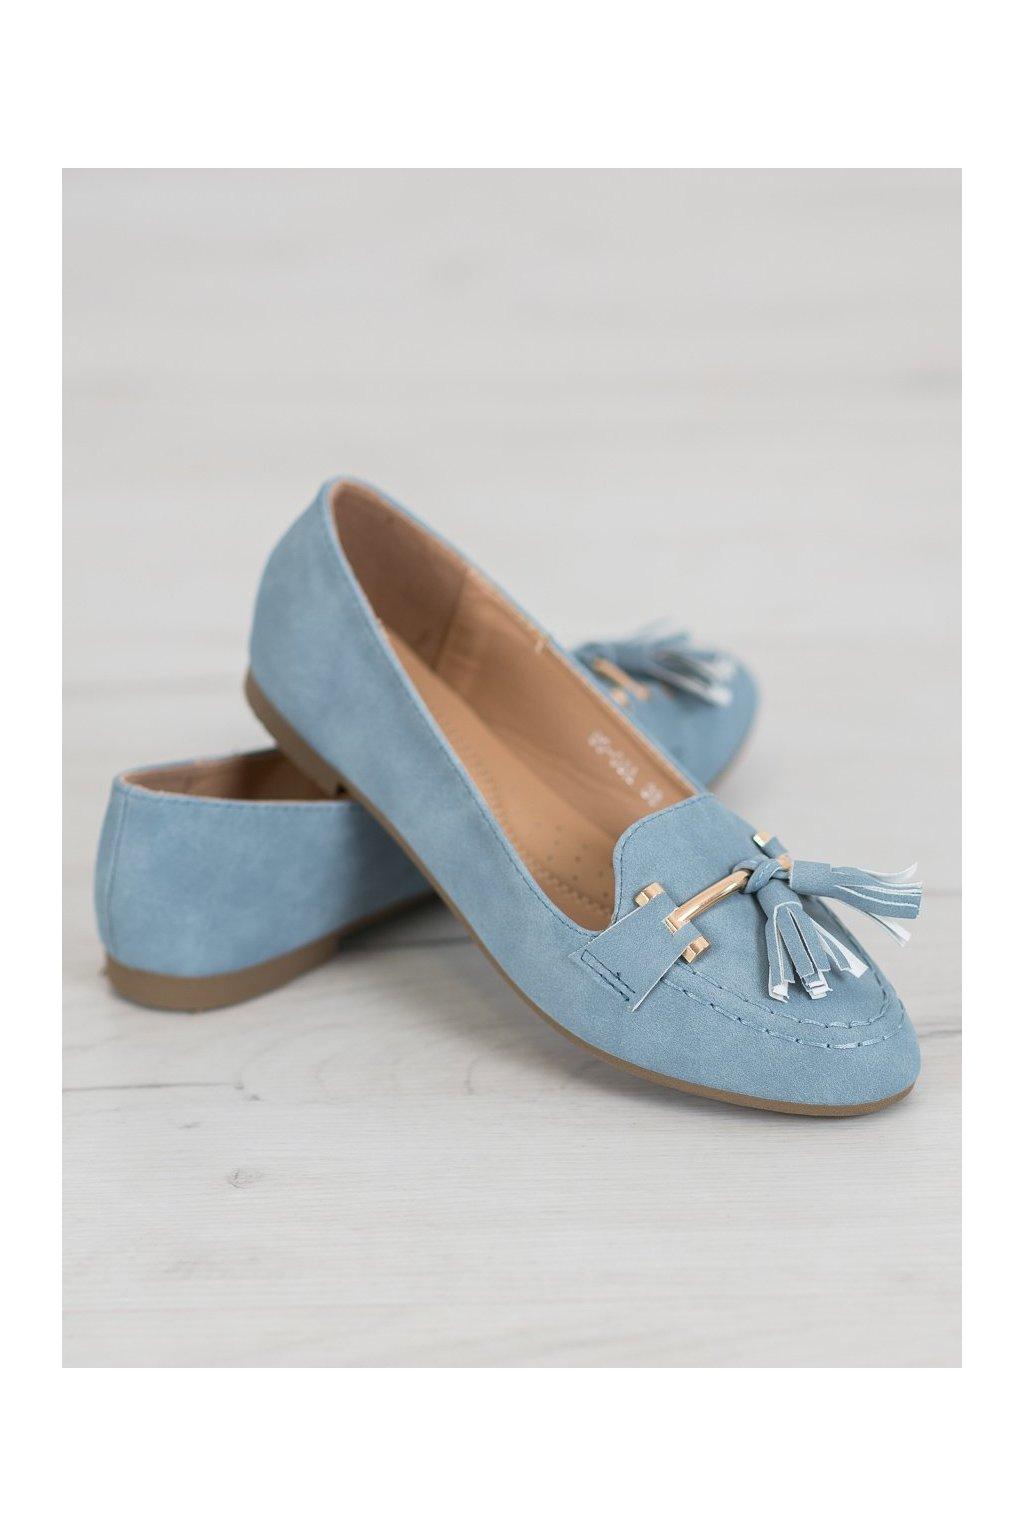 Modré topánky Nio nio kod 99-08A-BL